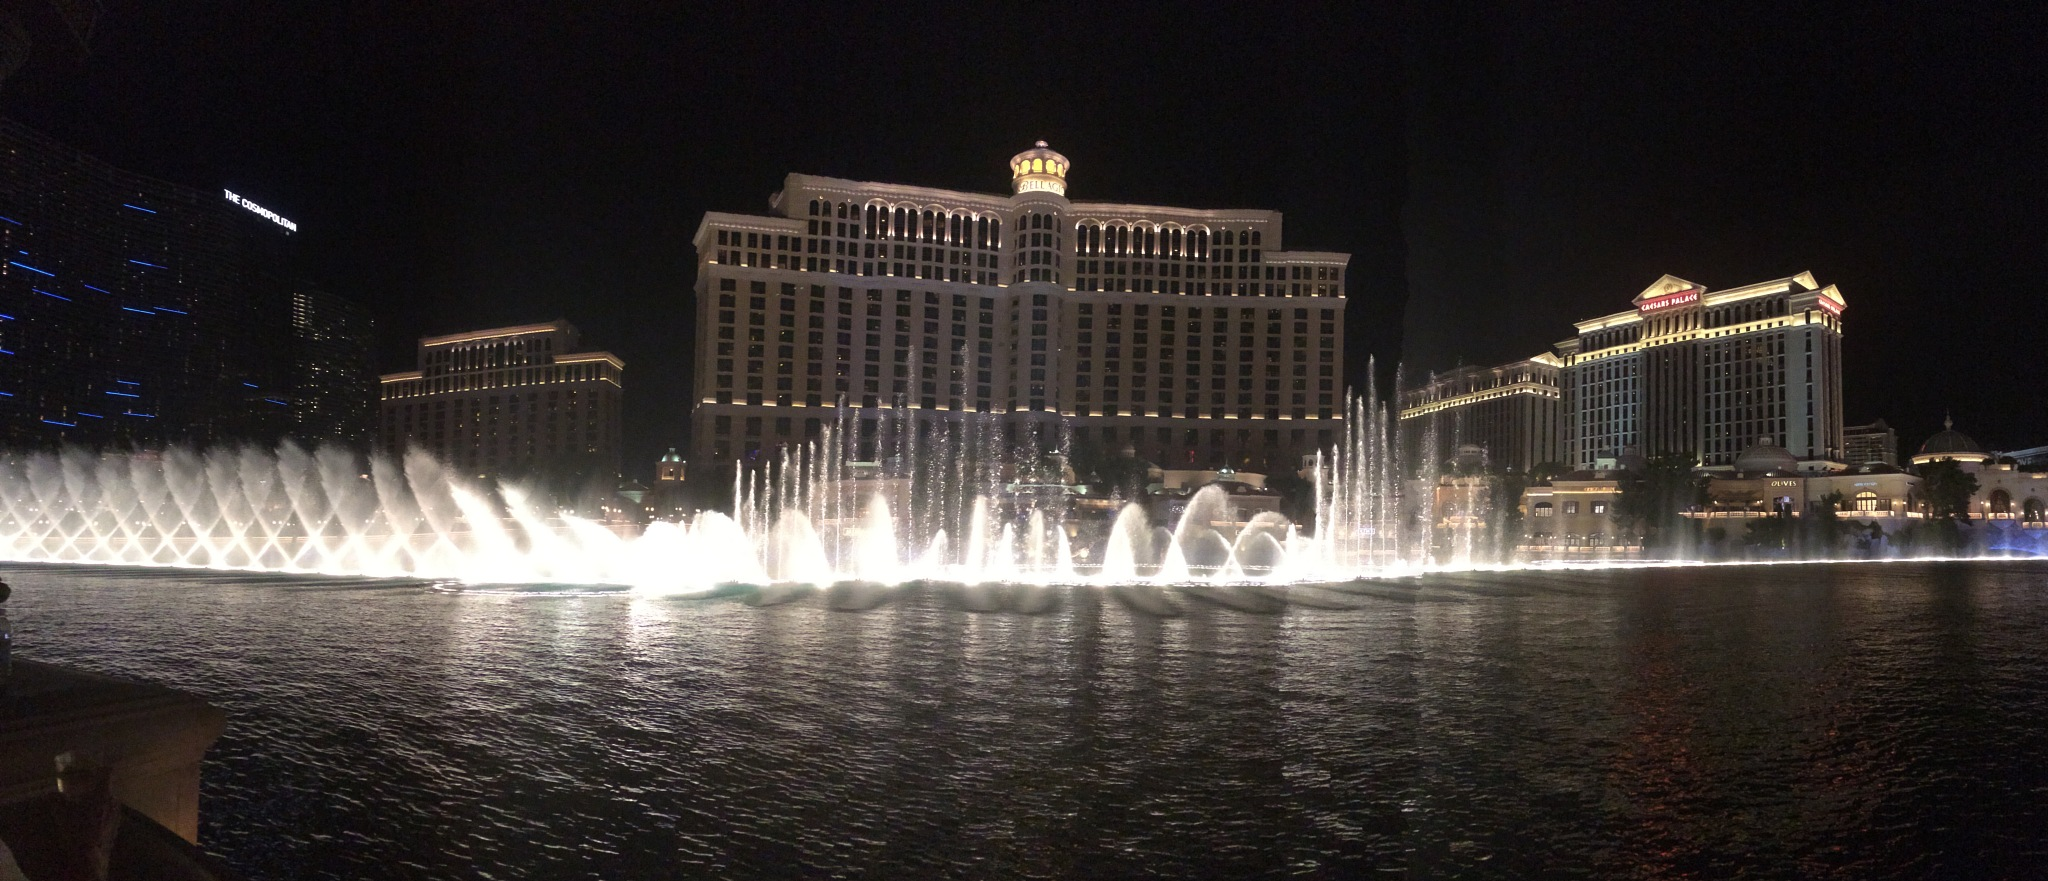 Las Vegas Bellagio by gkkosmetik